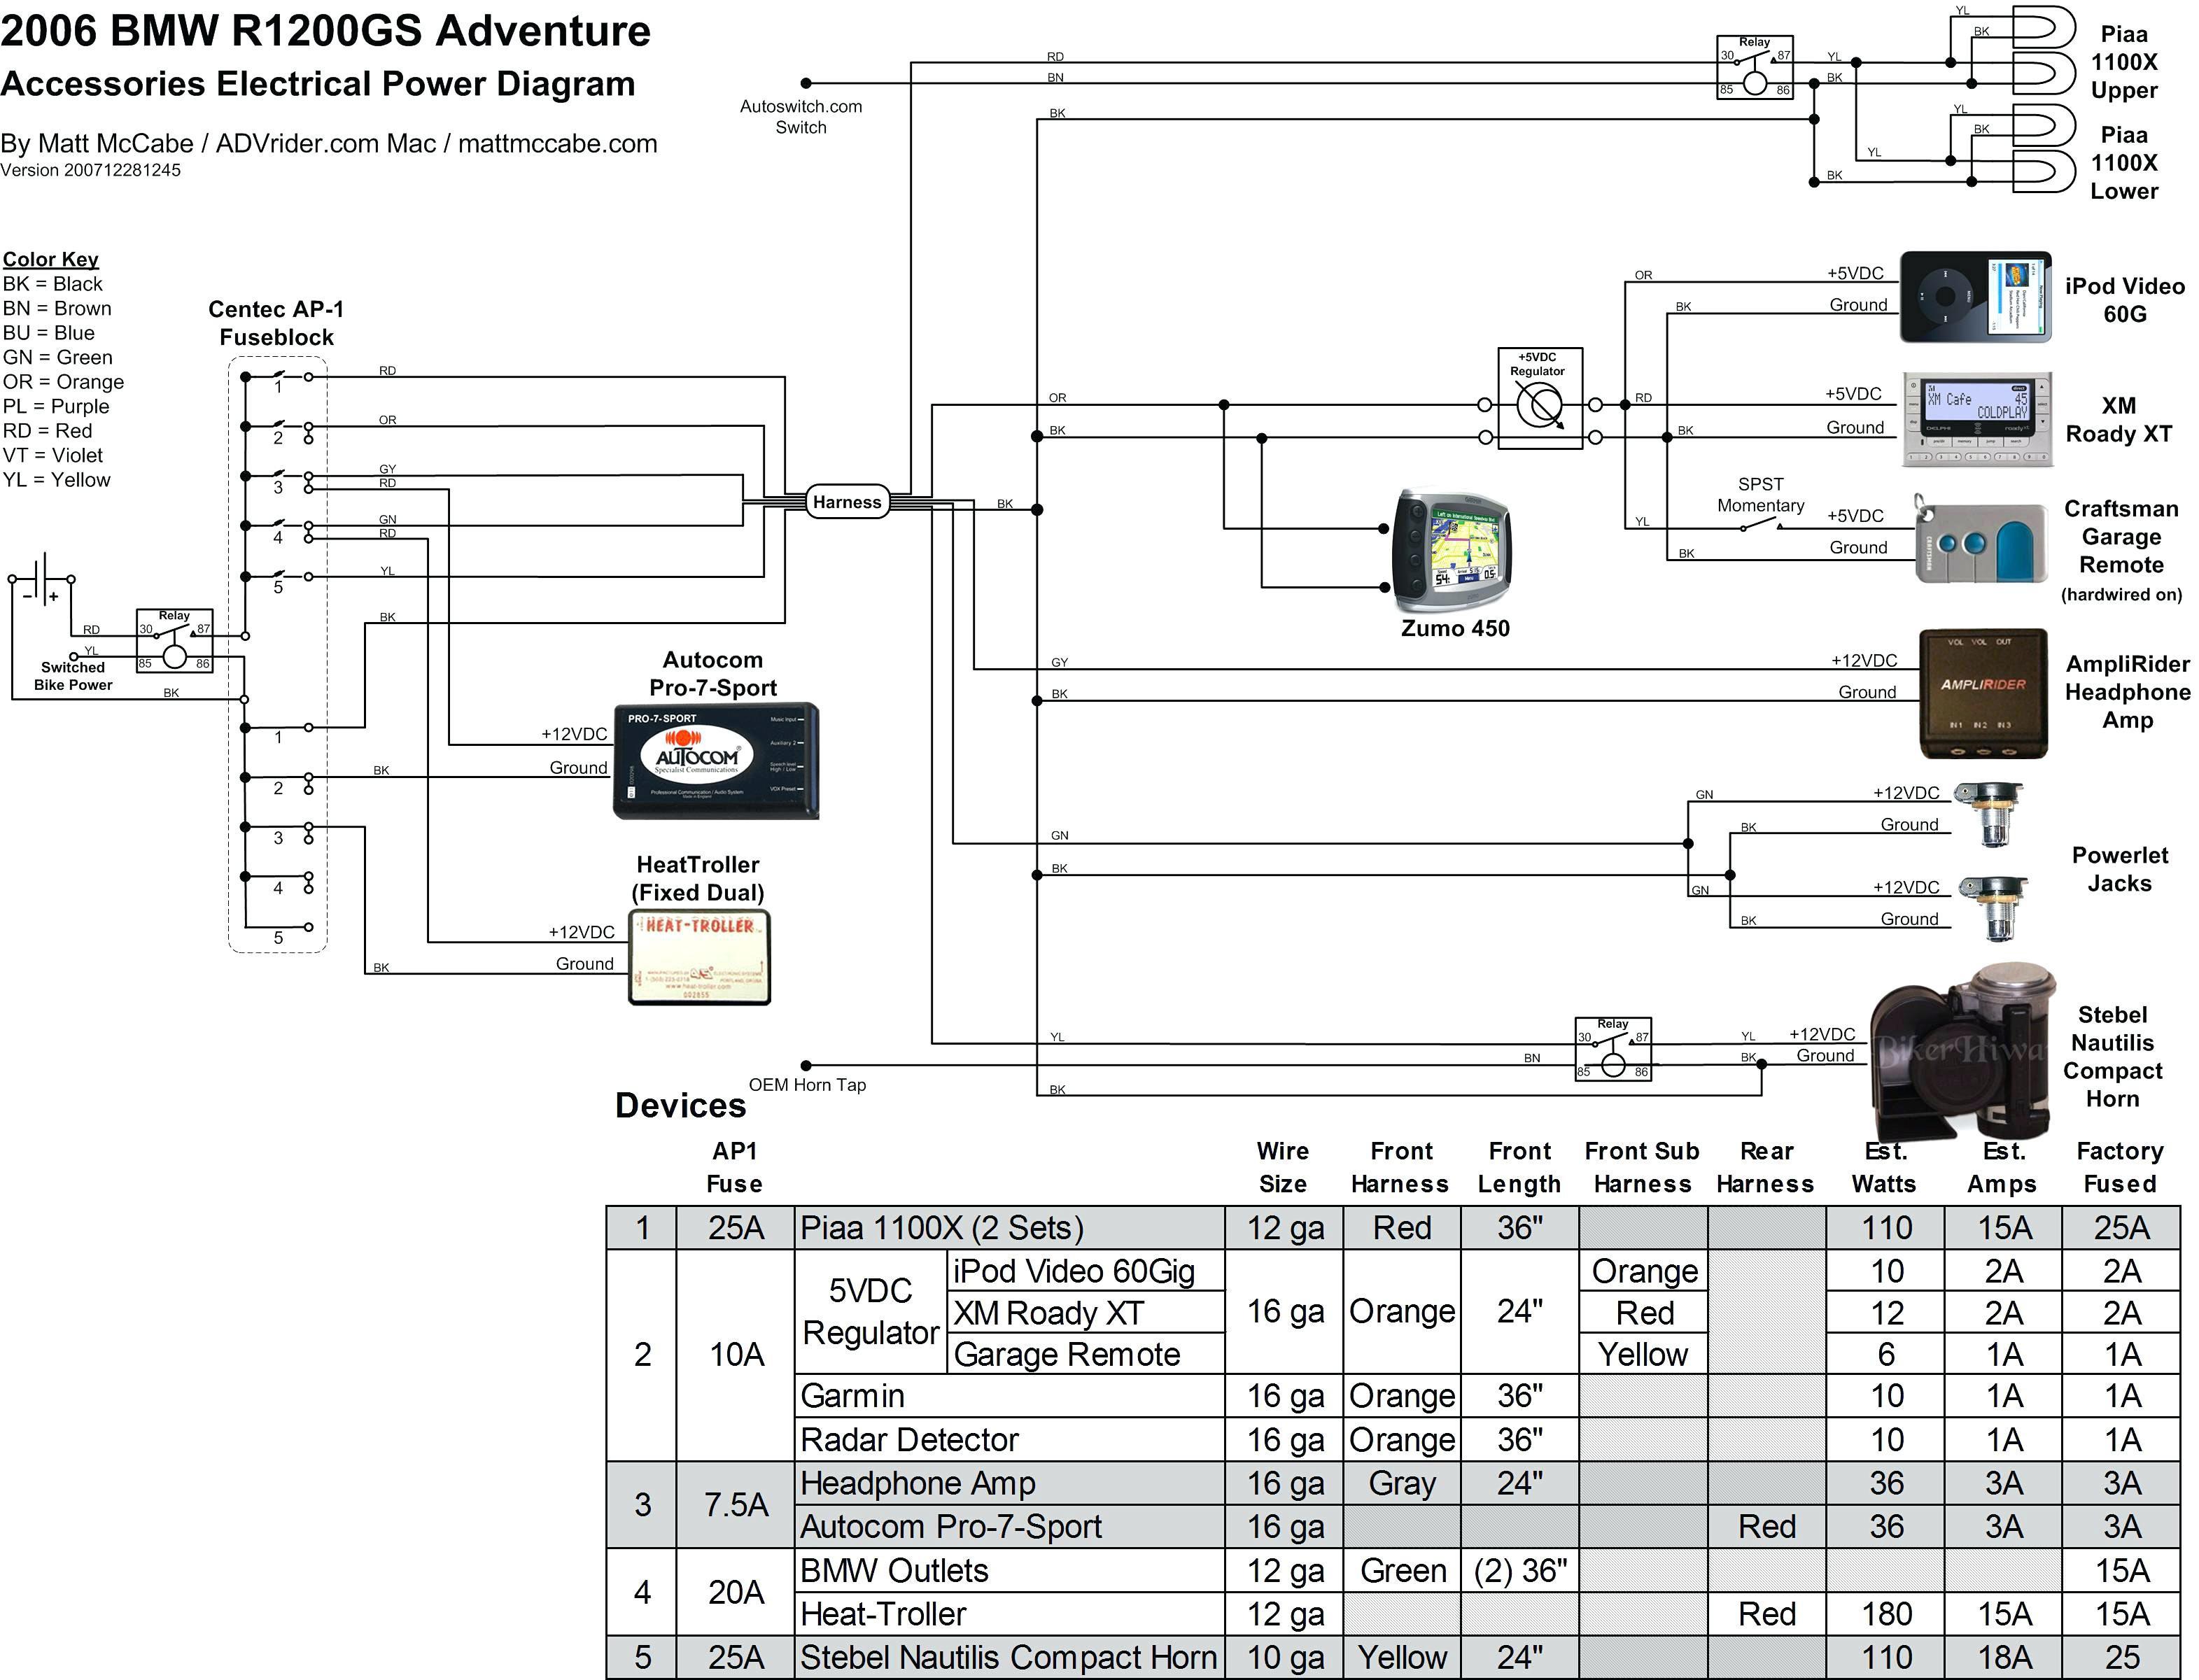 Fabulous Bmw Trailer Wiring Harness Basic Electronics Wiring Diagram Wiring Cloud Dulfrecoveryedborg